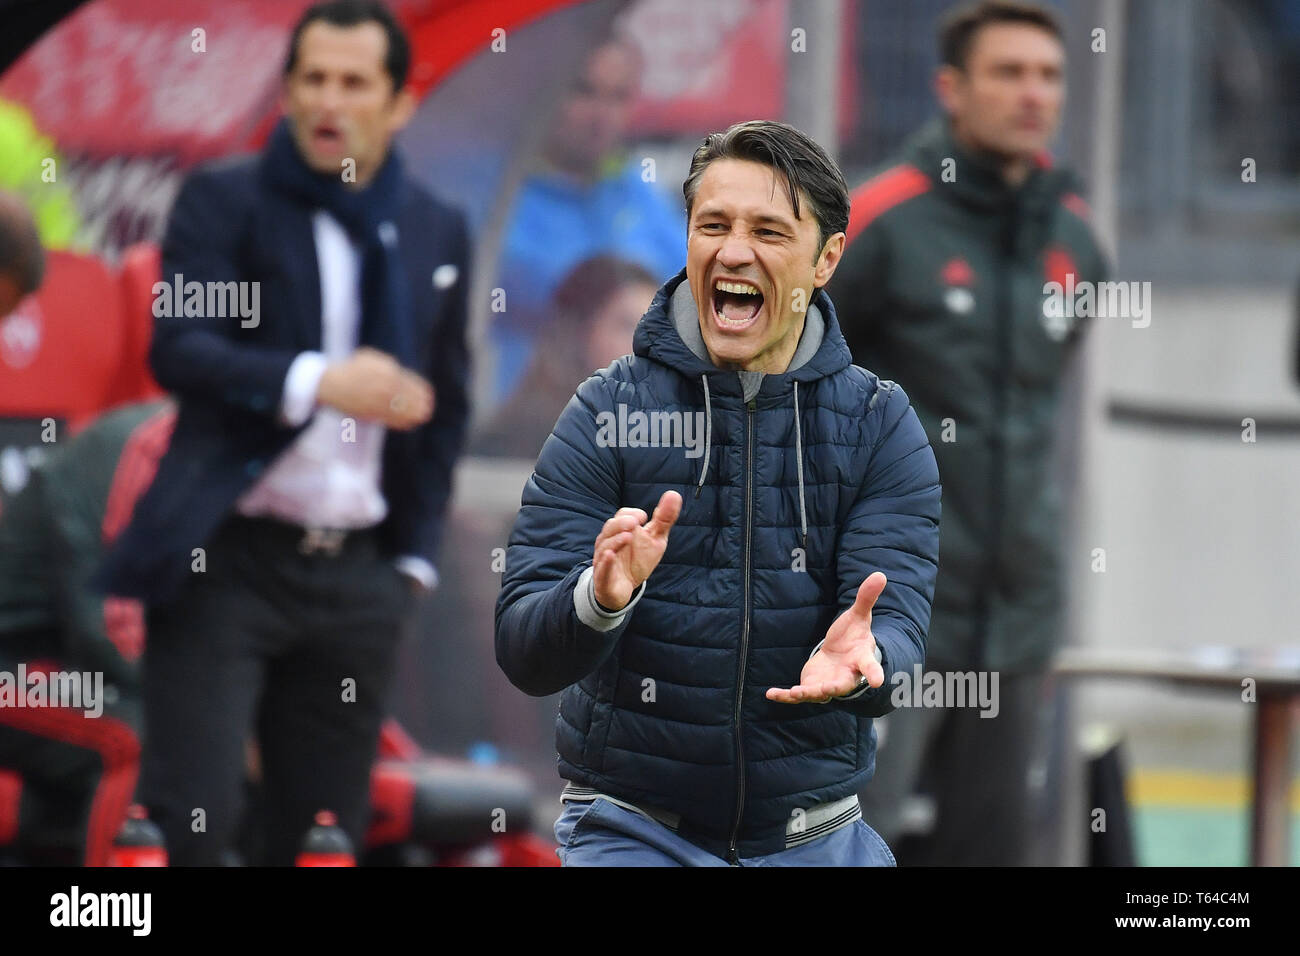 Nuremberg, Deutschland. 28th Apr, 2019. Niko KOVAC (coach FC Bayern Munich) loudly gives instructions, gesture, single picture, truncated single motive, half figure, half figure, hi: Hasan SALIHAMIDZIC (sports director FC Bayern Munich). Soccer 1. Bundesliga, 31.matchday, matchday31, 1.FC Nuremberg (N) -FC Bayern Munich (M), 1-1, on 28/04/2019 in Nuernberg/Germany. MAX MORLOCK STADIUM. DFL REGULATIONS PROHIBIT ANY USE OF PHOTOGRAPH AS IMAGE SEQUENCES AND/OR QUASI VIDEO. | usage worldwide Credit: dpa/Alamy Live News - Stock Image